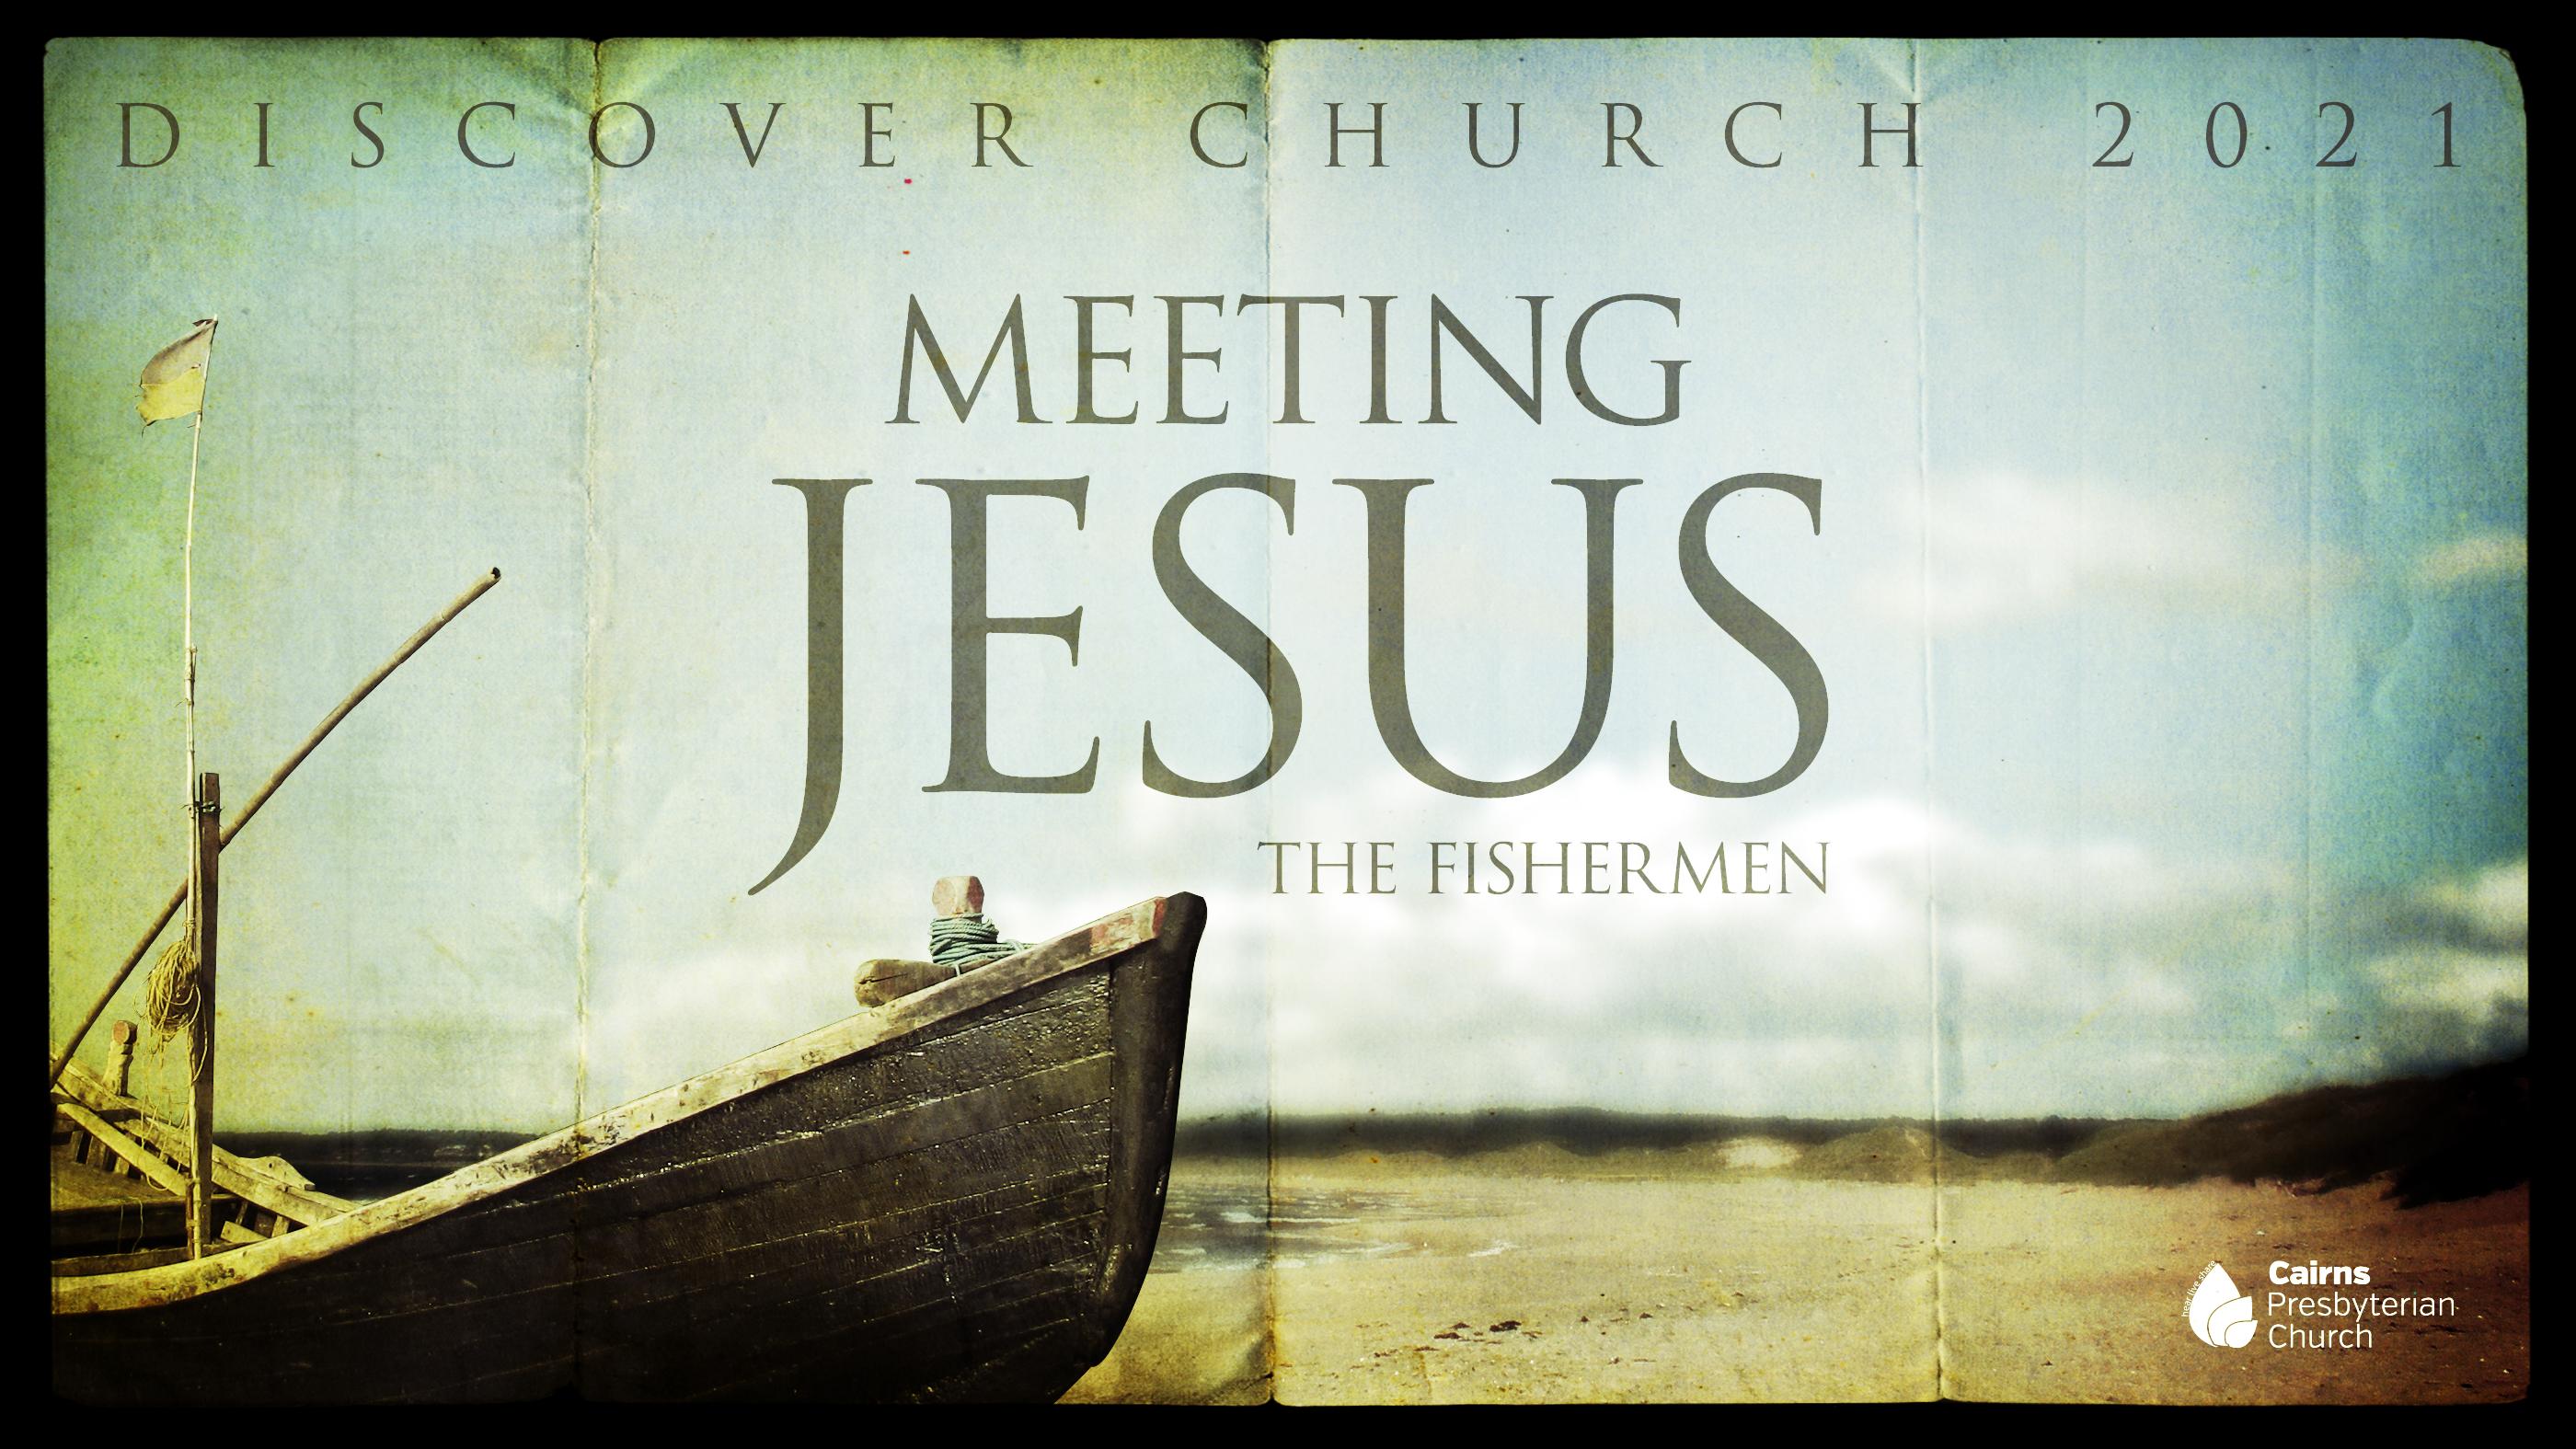 A Fisherman Meets Jesus